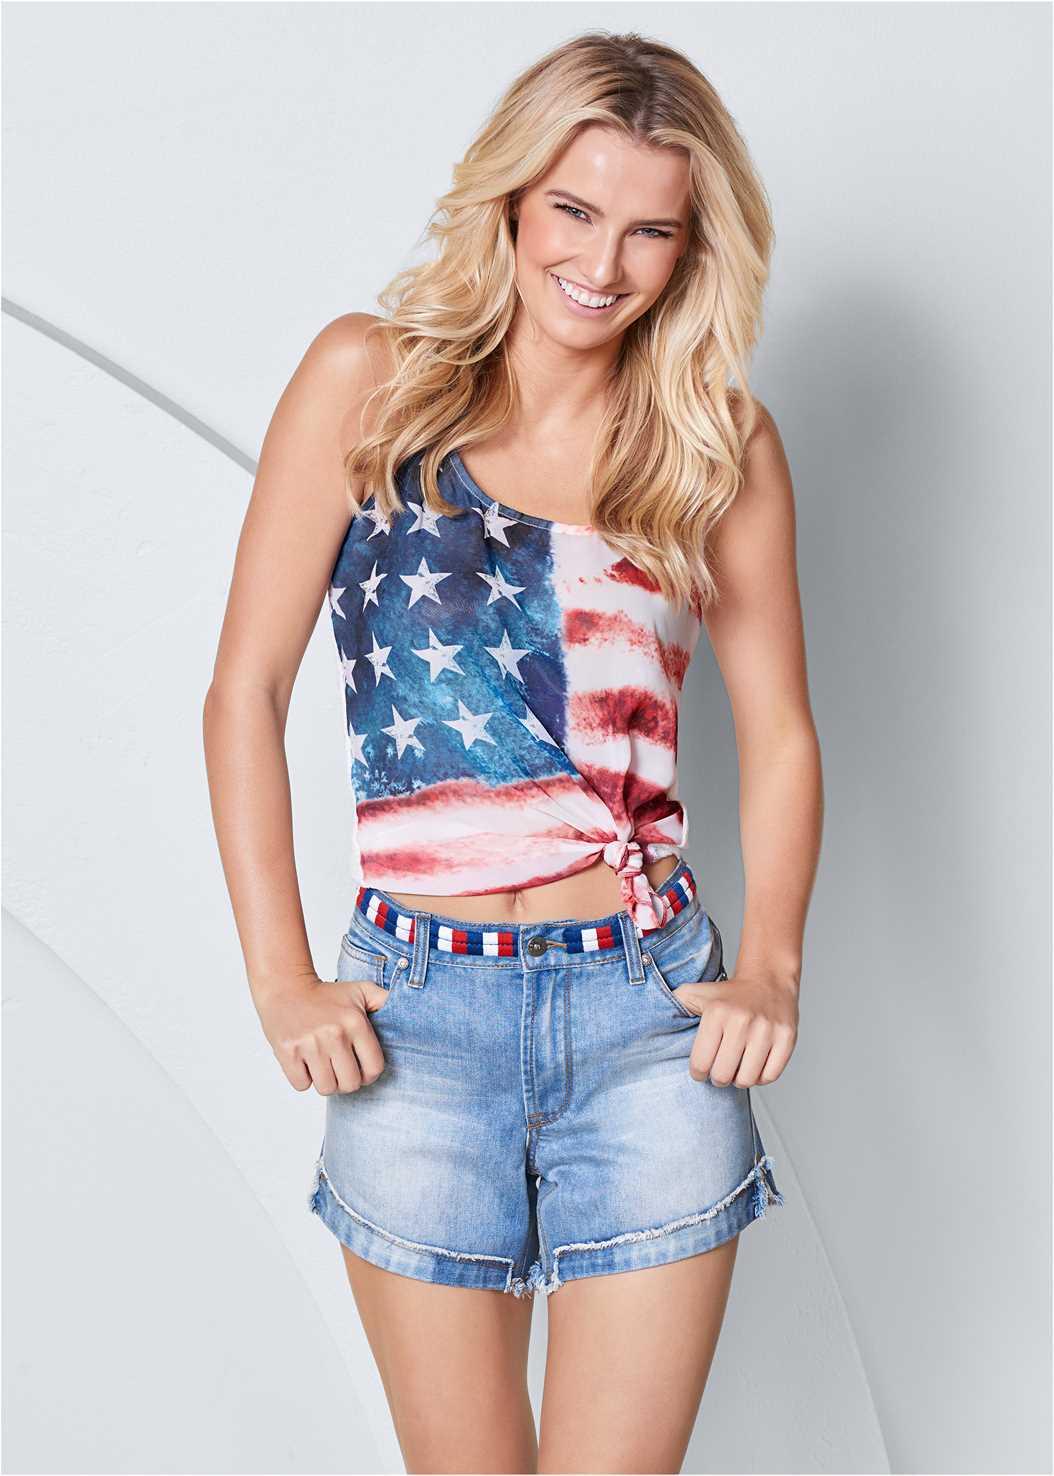 Waistband Detail Shorts,American Flag Tank